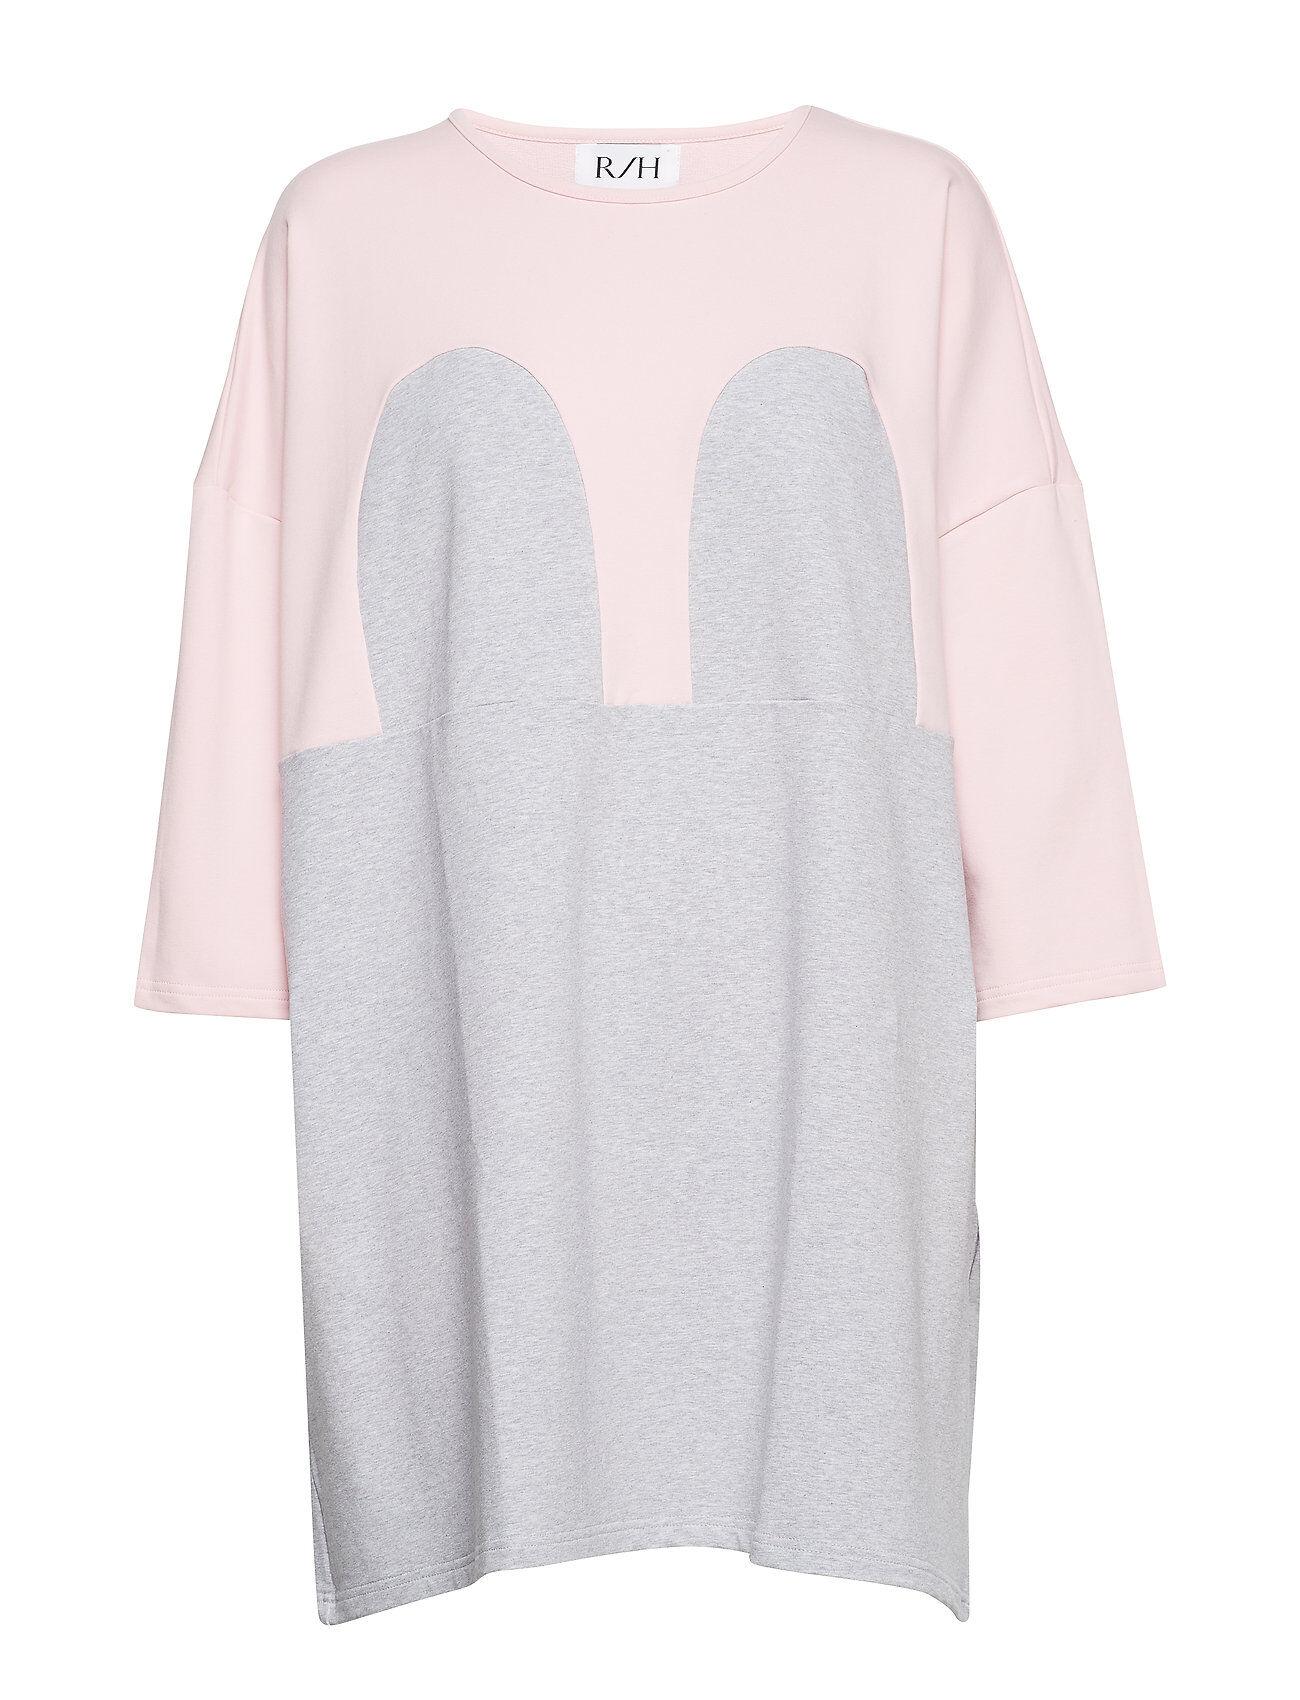 R/H Studio Mickey Square Dress Lyhyt Mekko Vaaleanpunainen R/H Studio